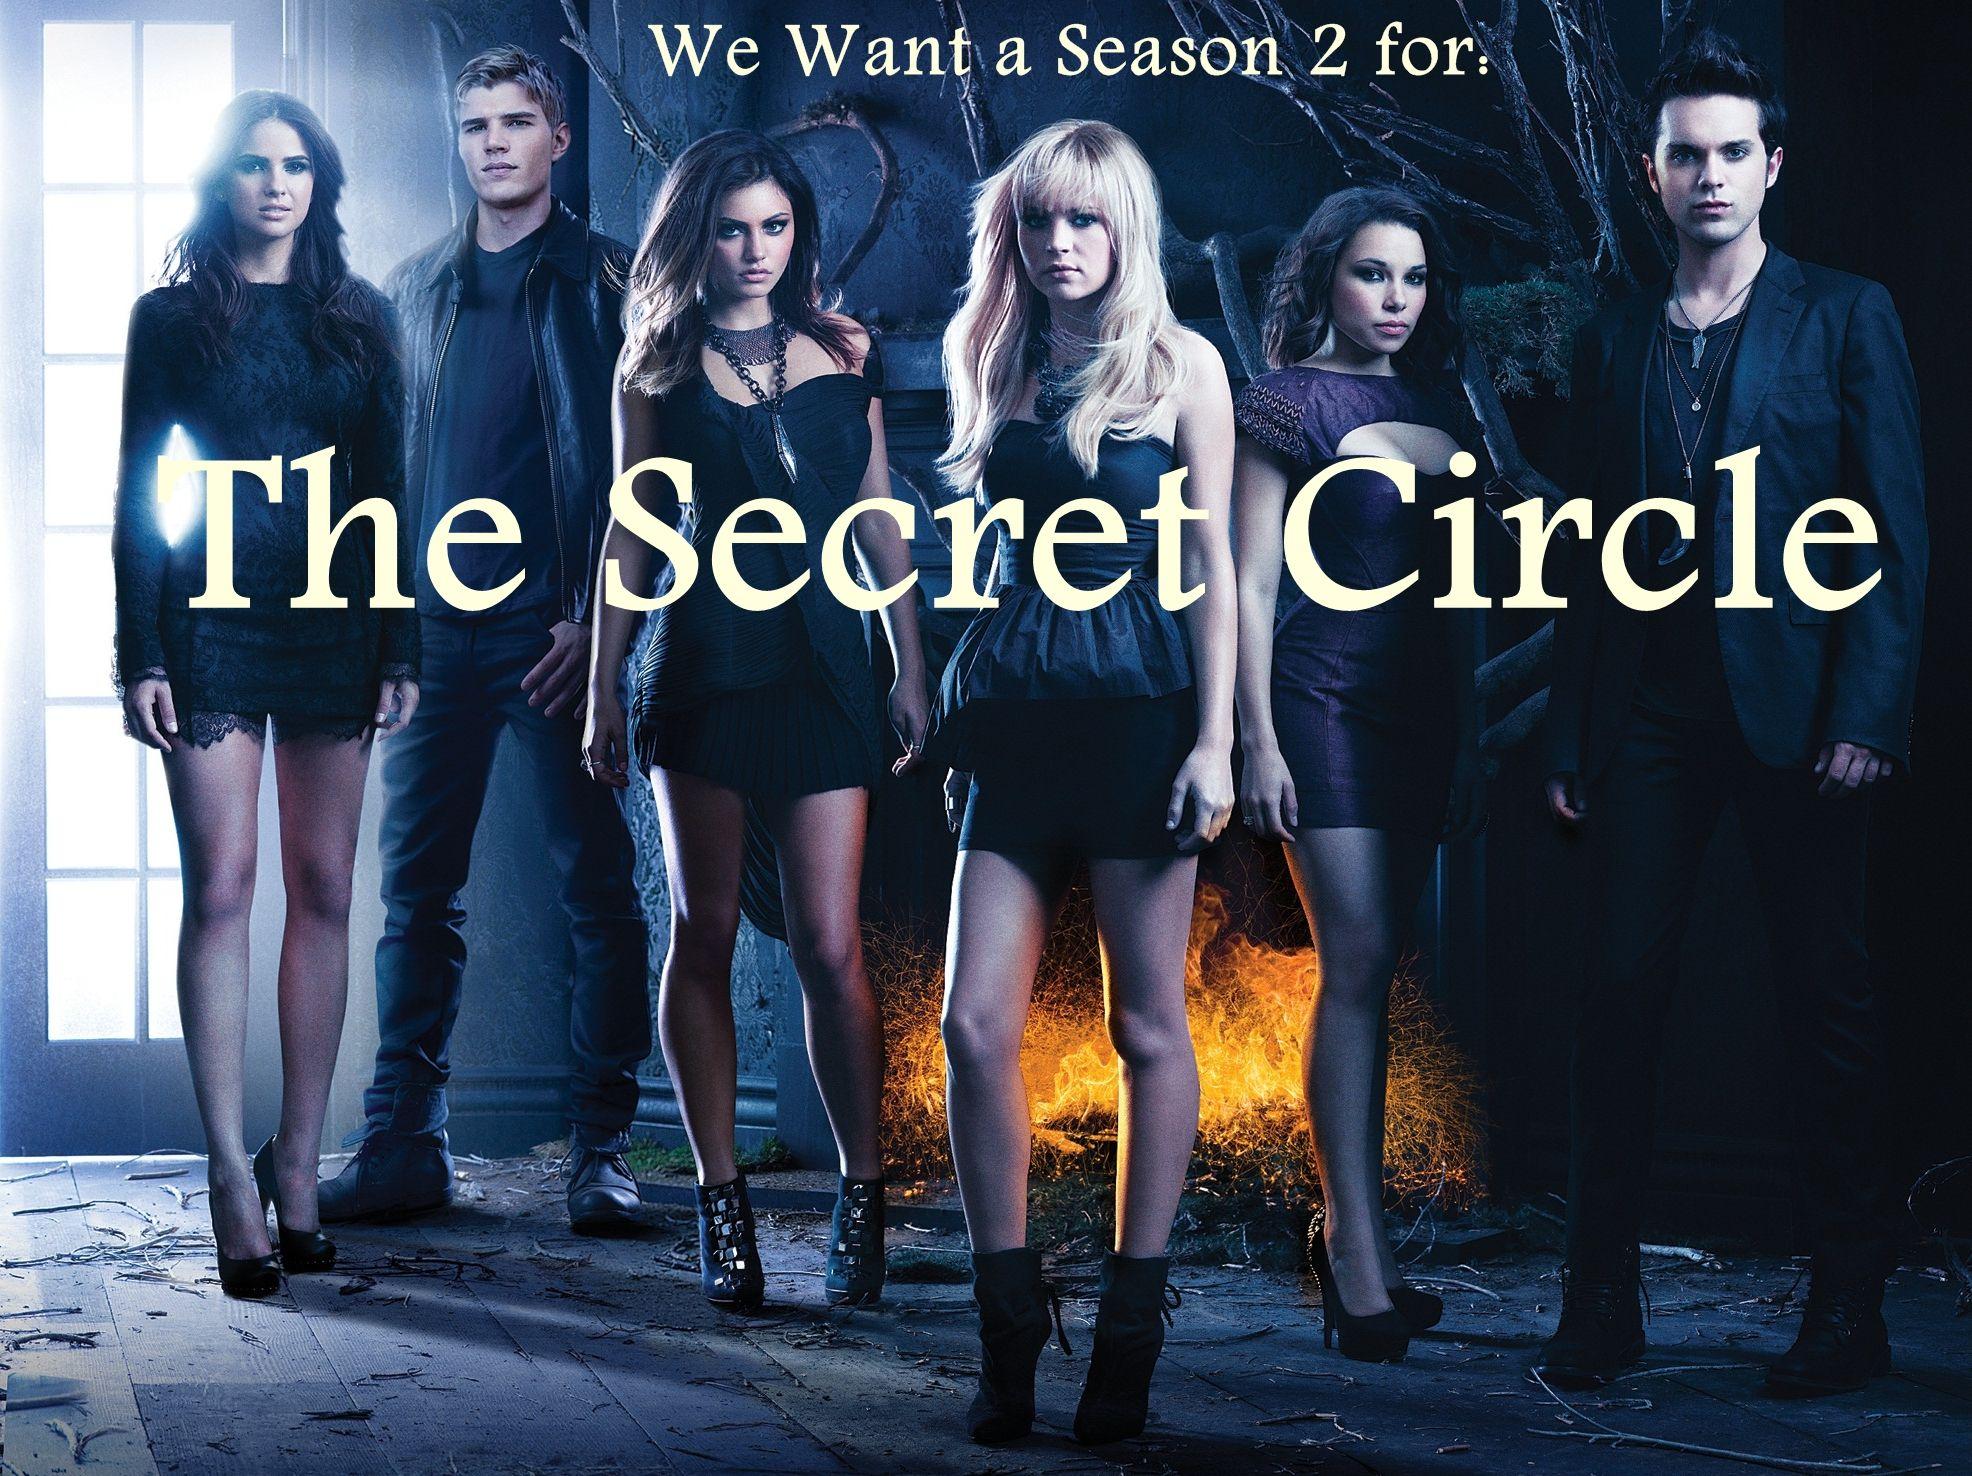 The Secret Circle Season 2 Season 2 For The Secret Circle